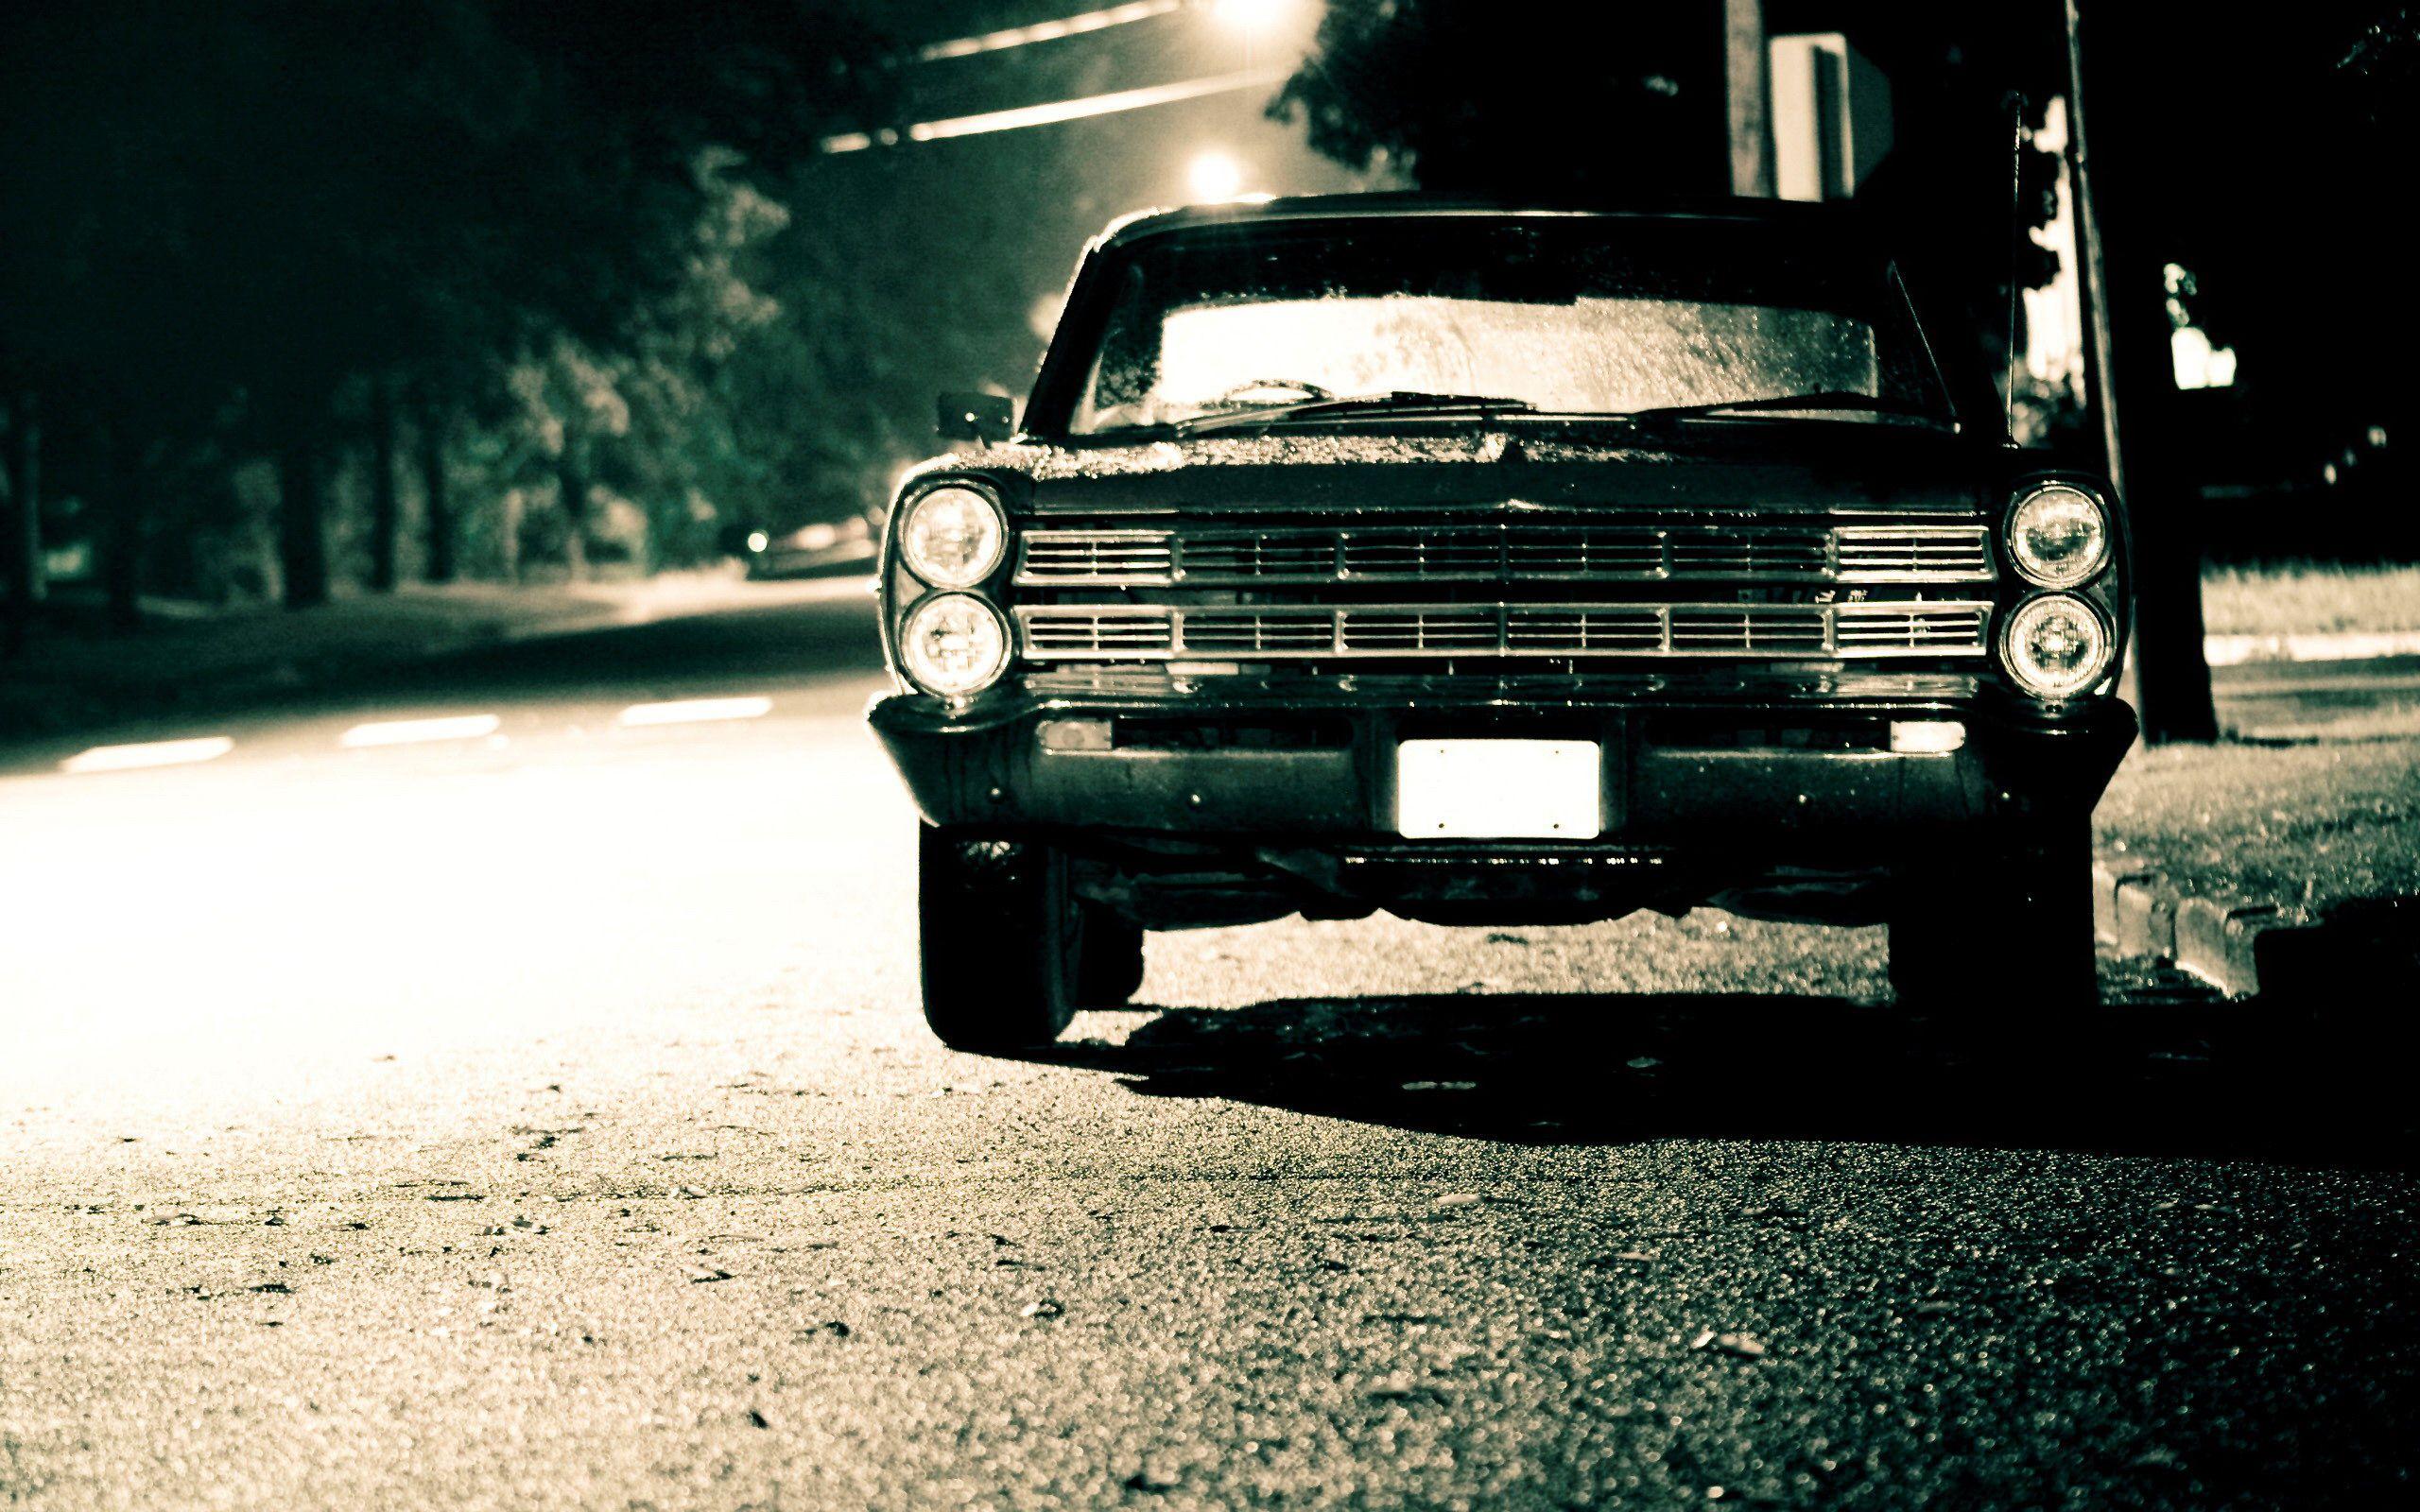 Vintage Car Vintage Cars Classic Cars Hd Wallpaper